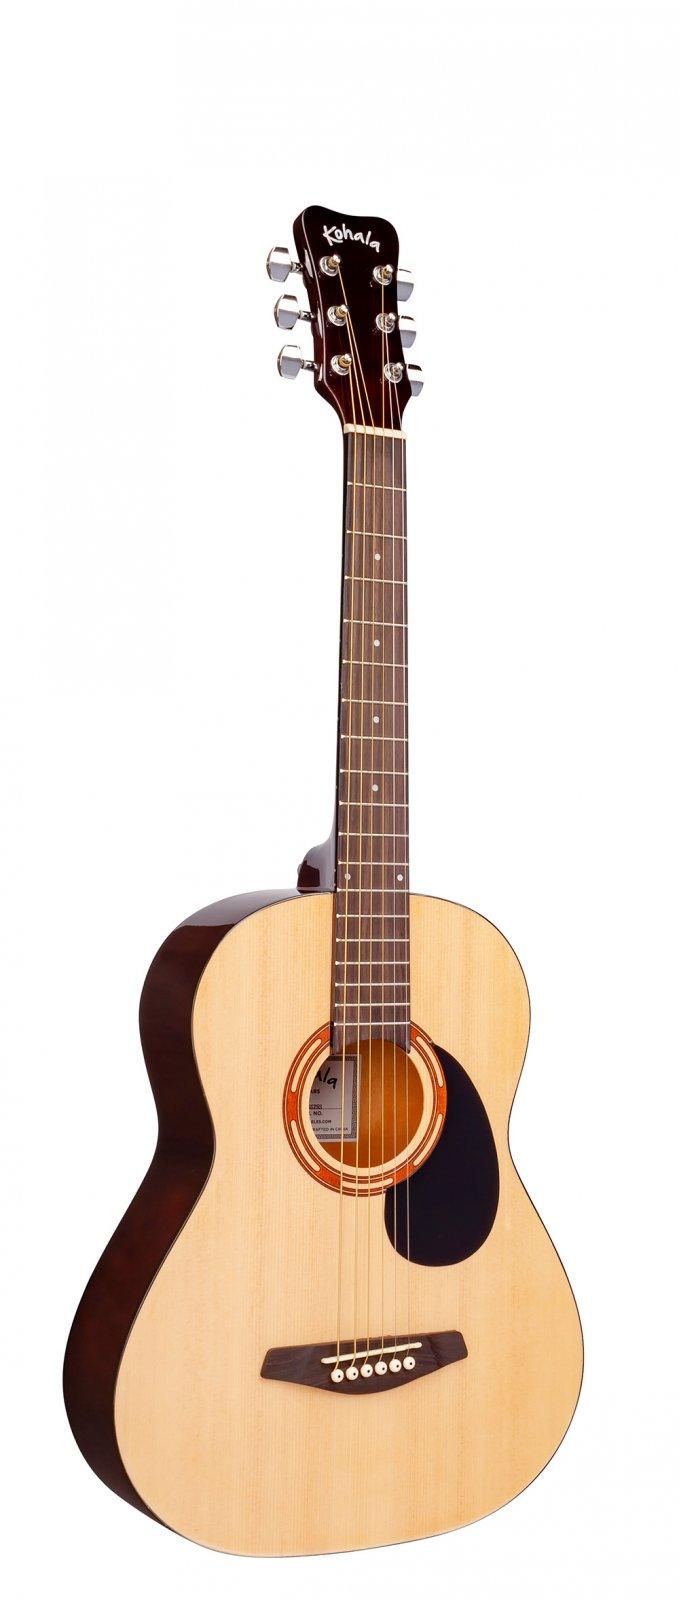 Kohala 3/4 Size Steel String Acoustic Guitar w/ bag